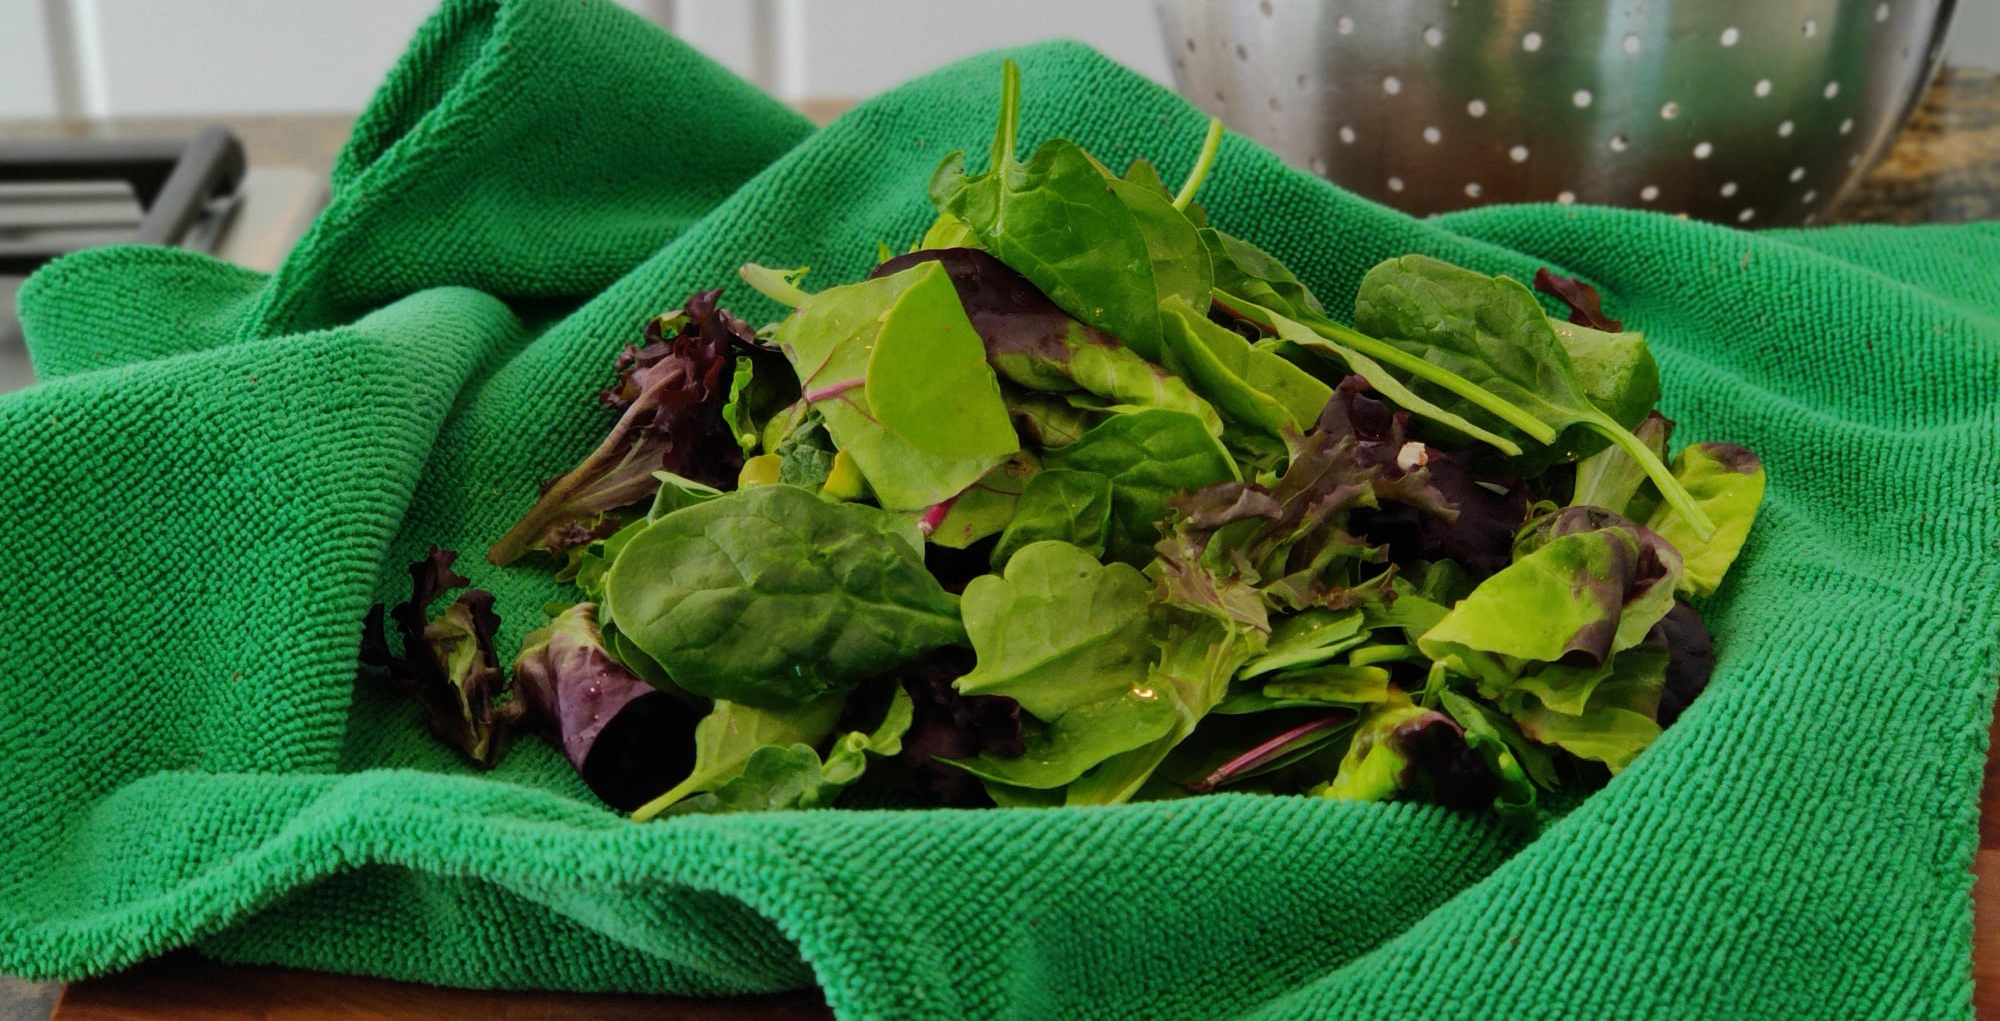 The Salad Sling